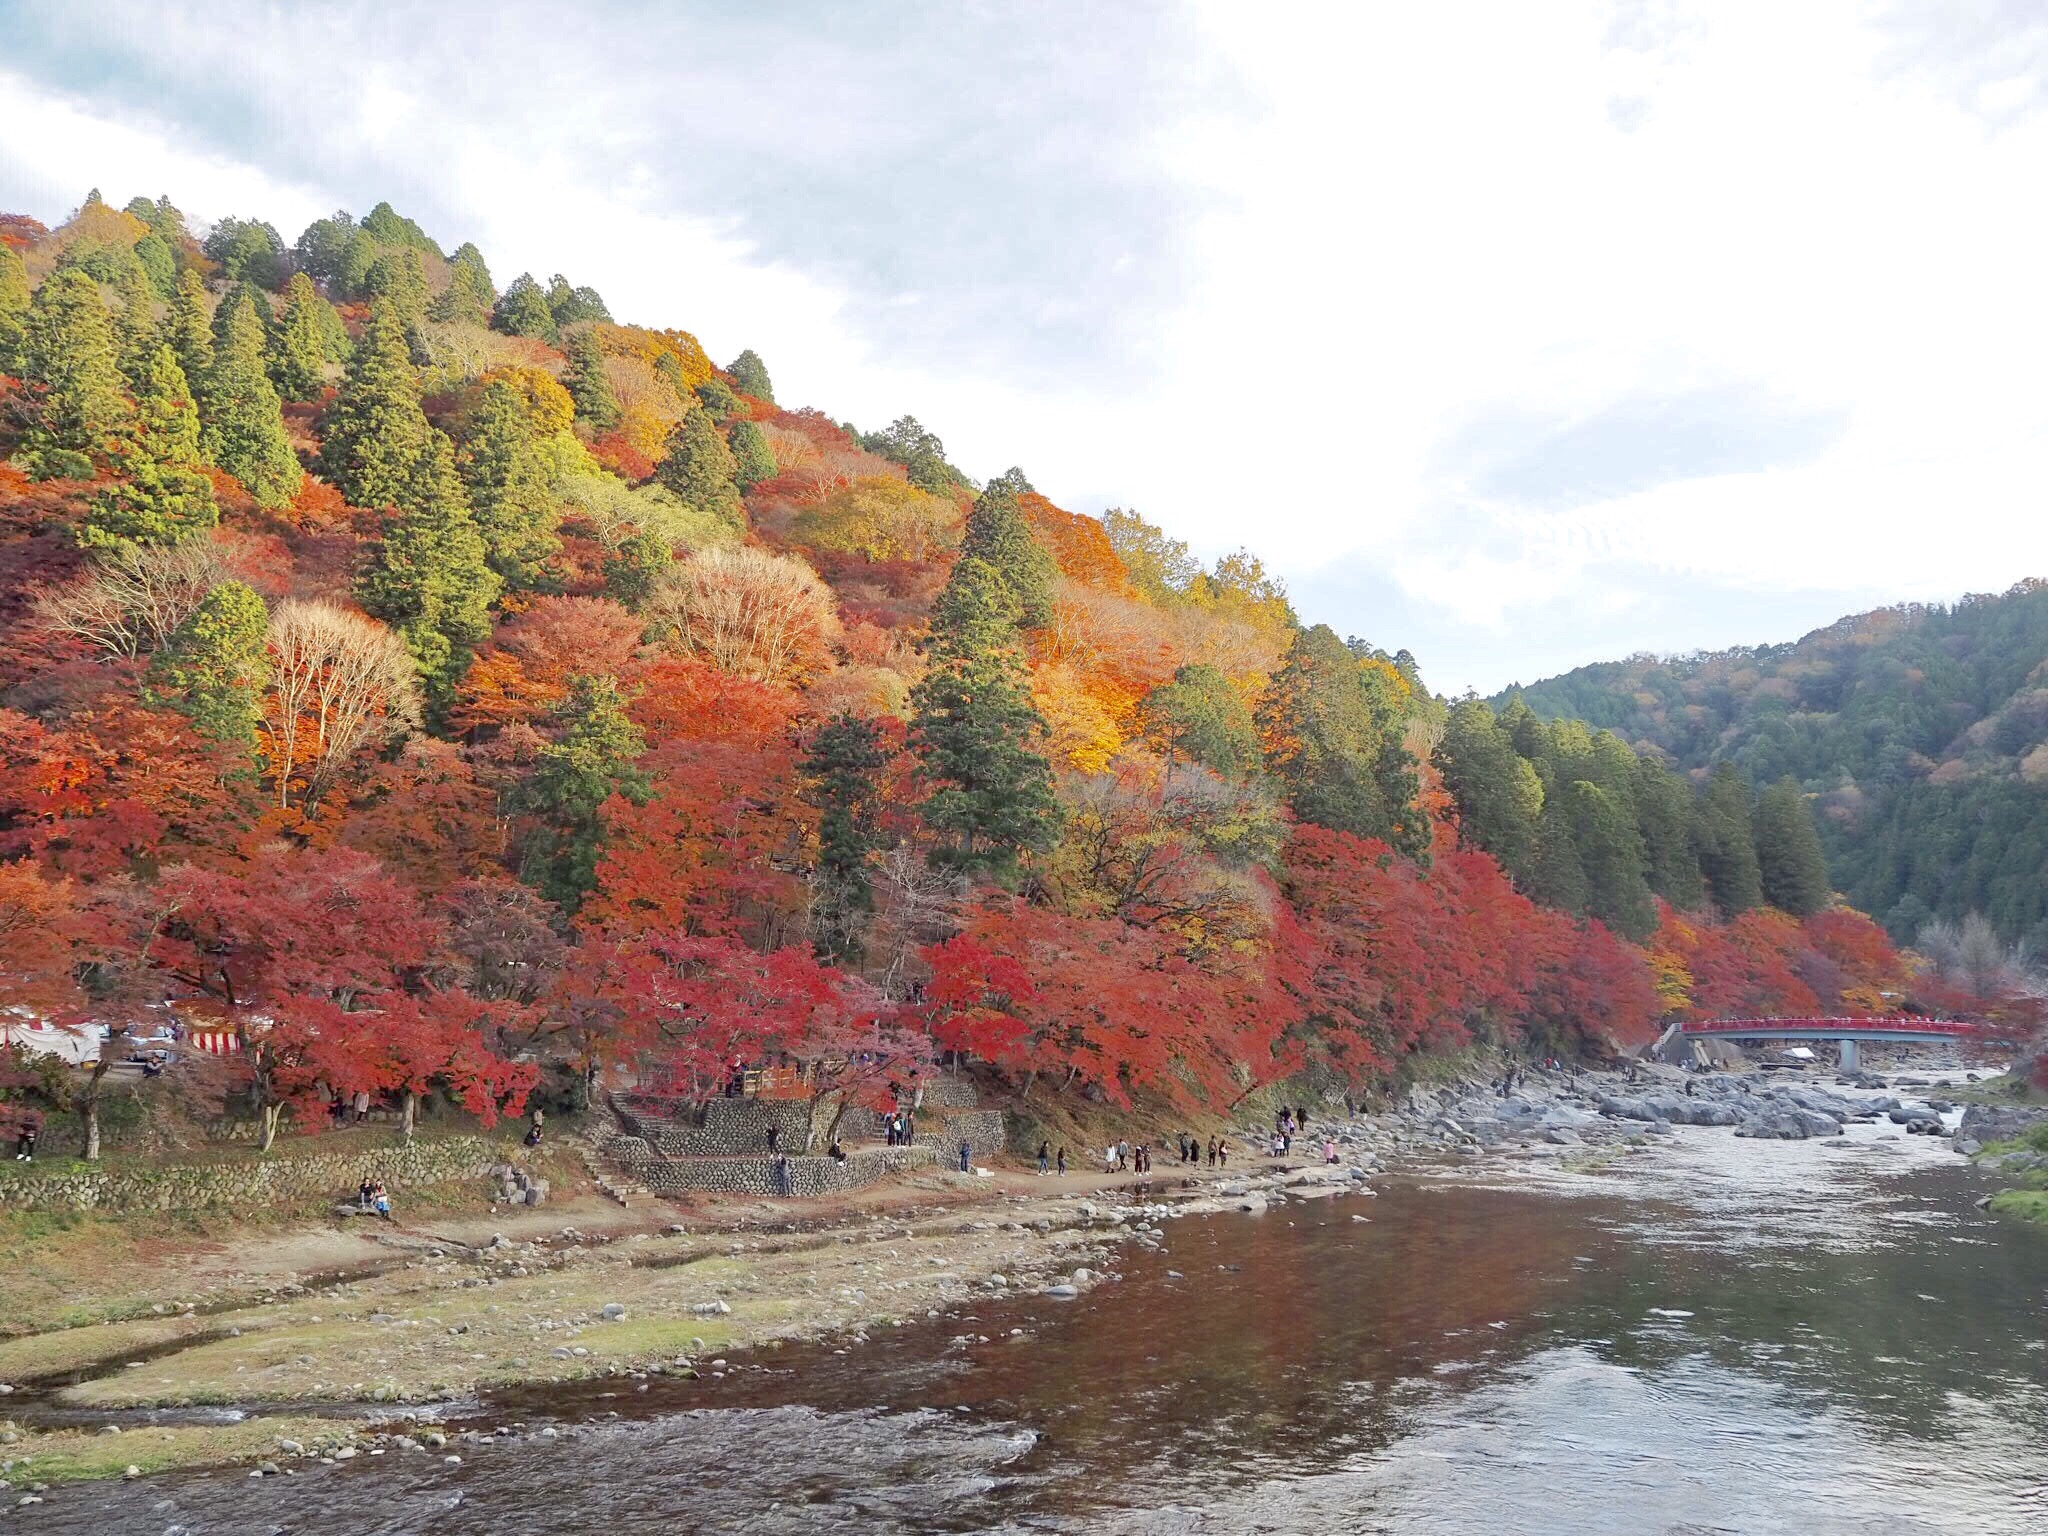 img 7433 - 香嵐渓 - 日本の秋を感じる 愛知県豊田市の紅葉スポット